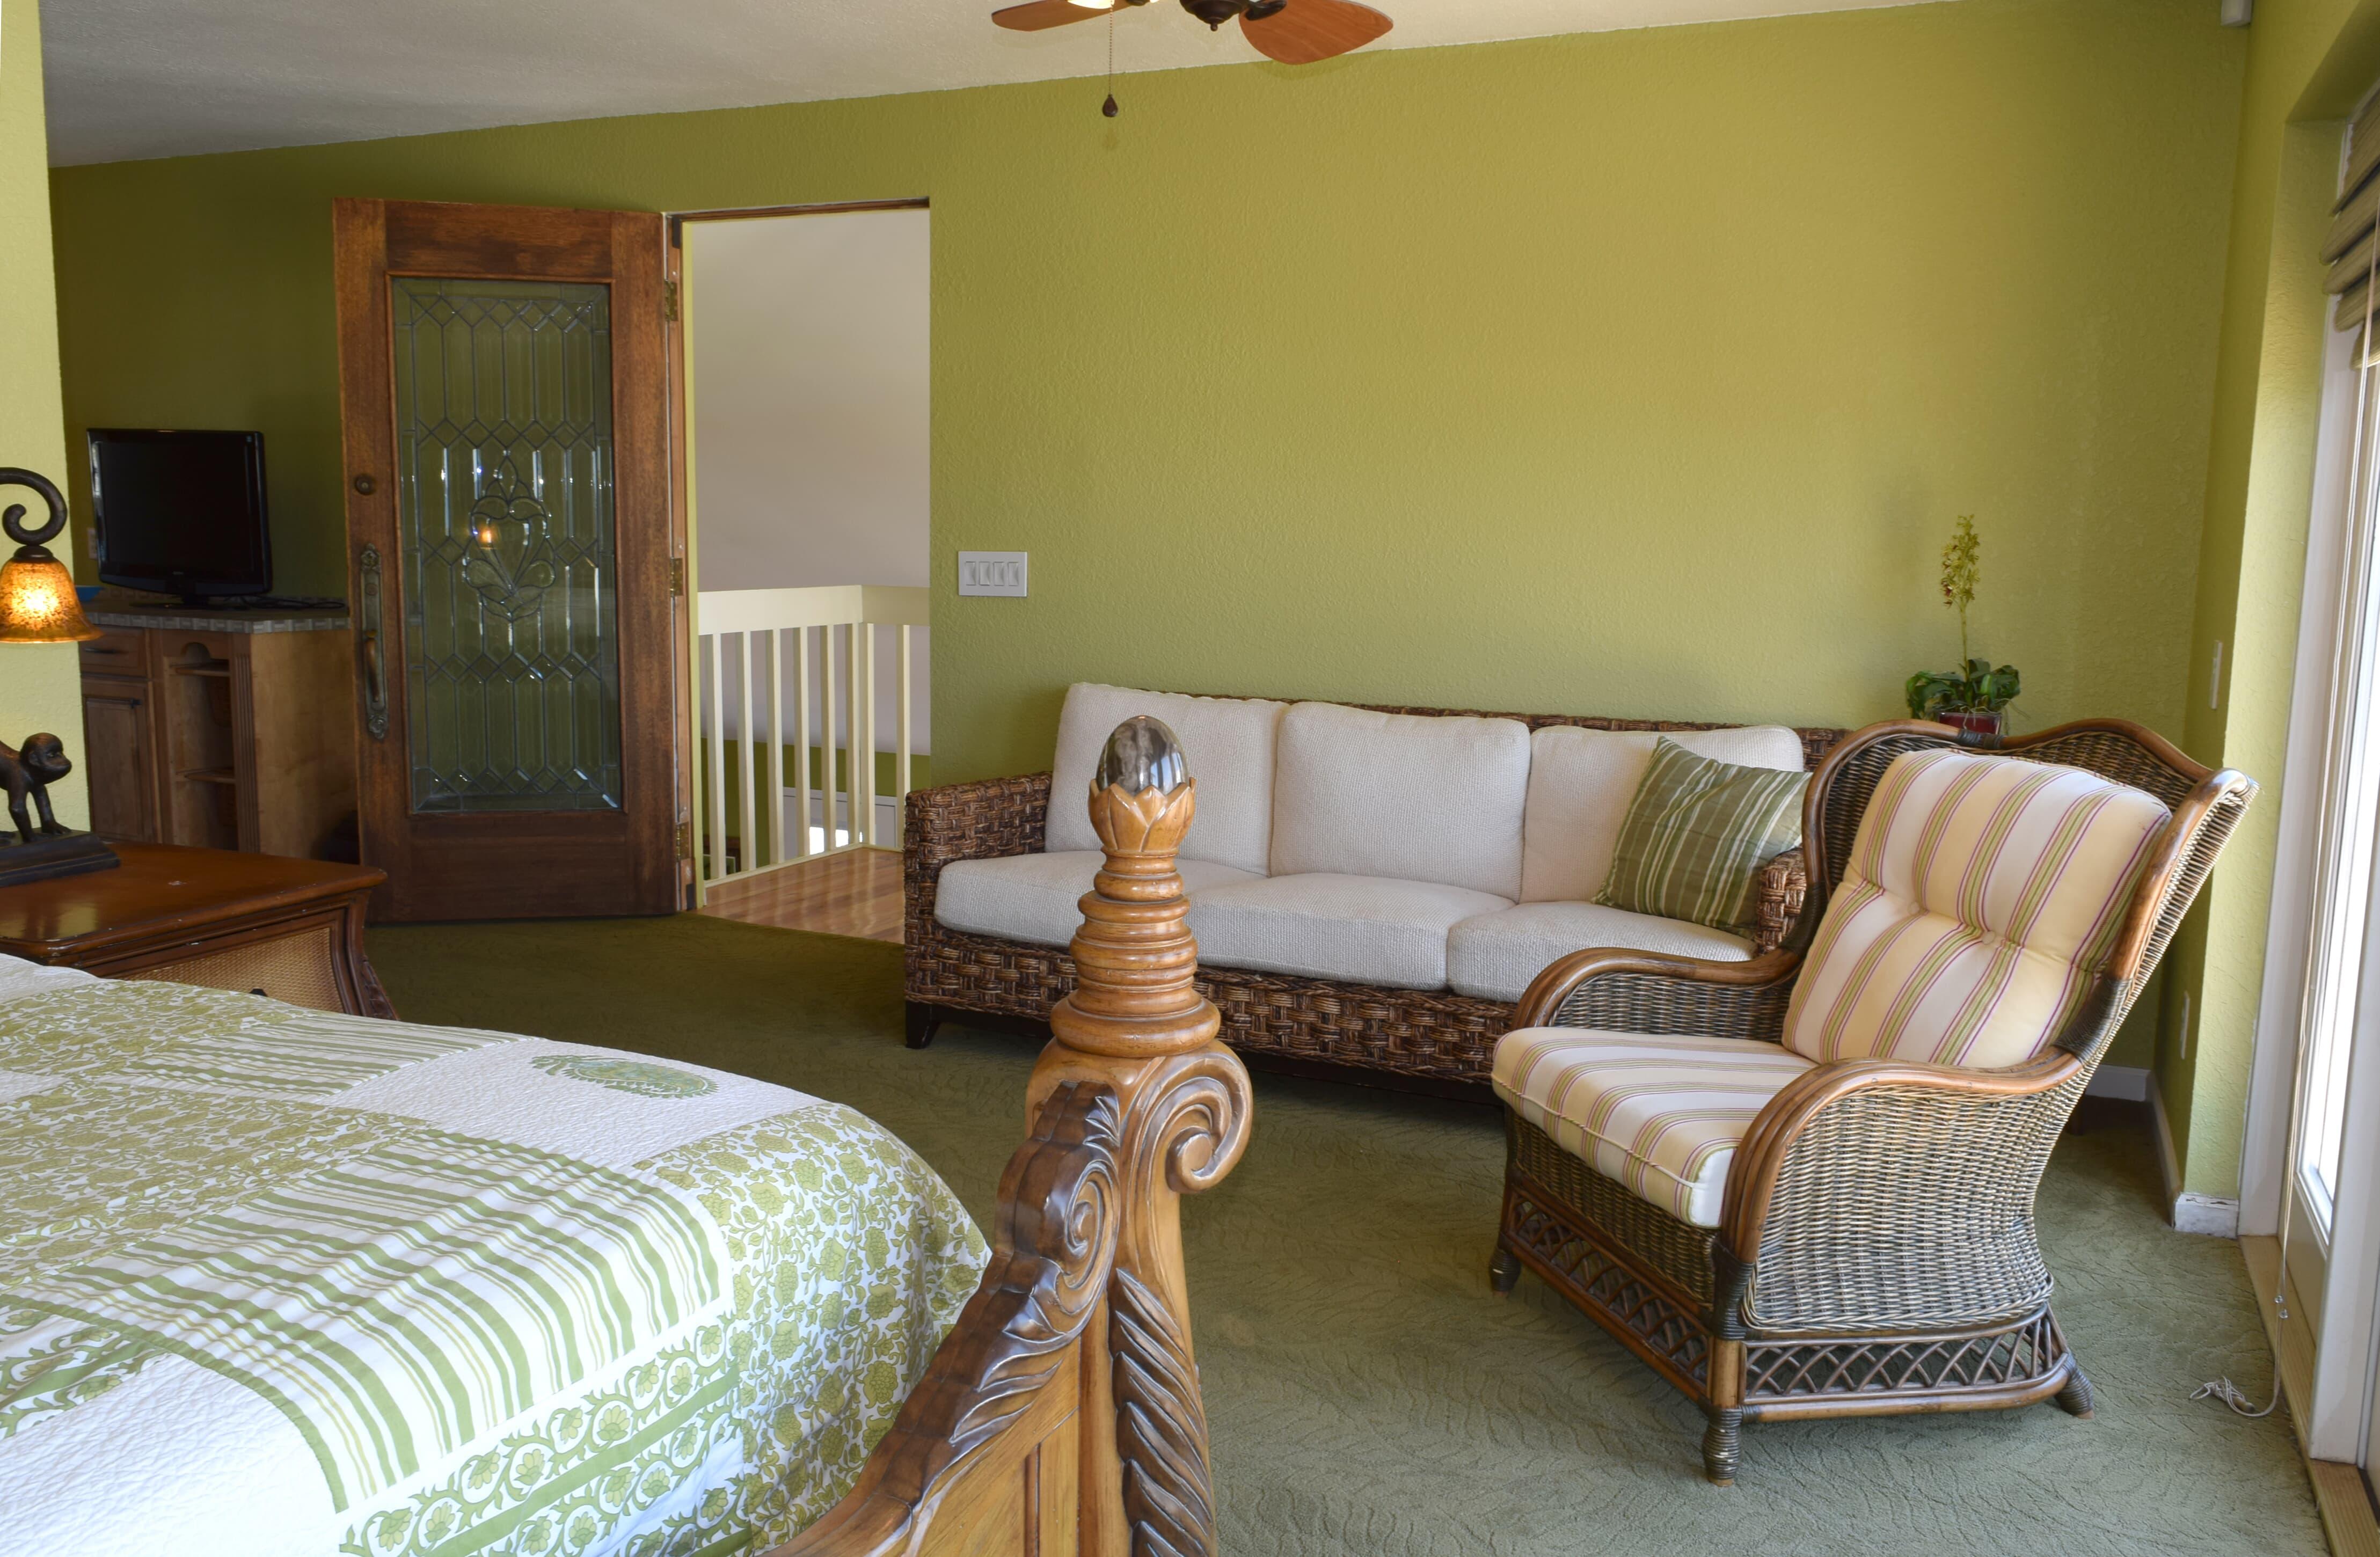 Maldonado 1010 House/Cottage rental in Pensacola Beach House Rentals in Pensacola Beach Florida - #15